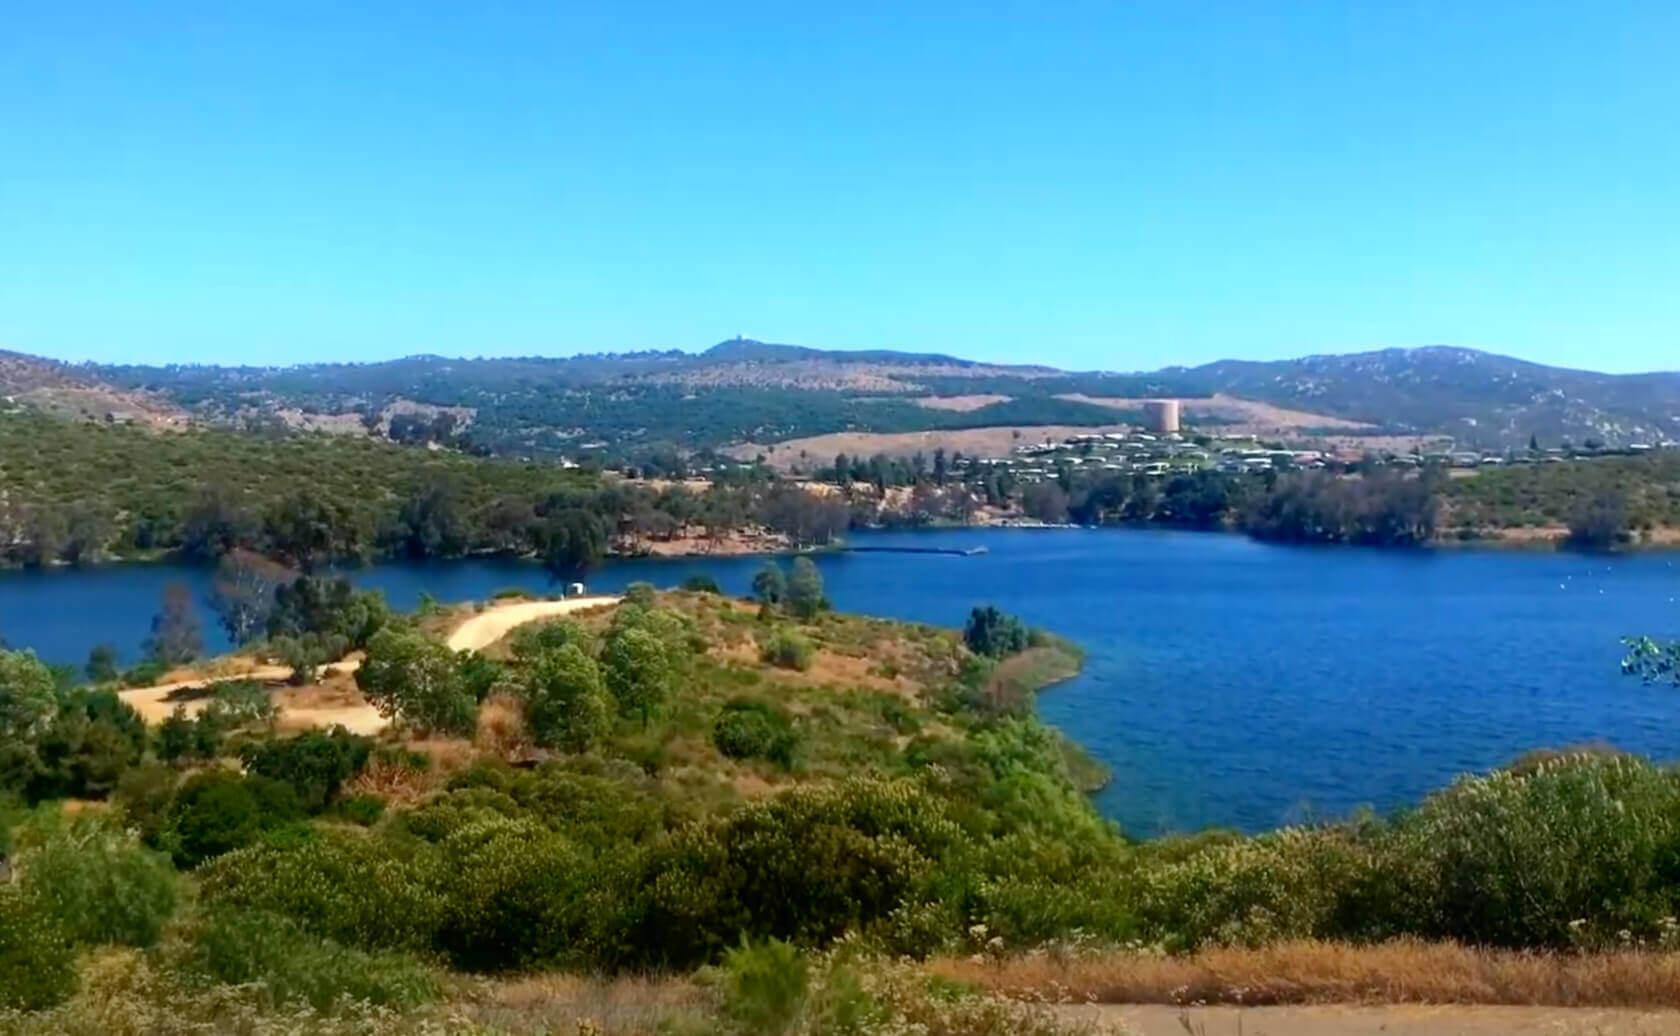 Jennings-Lake-Fishing-Guide-Report-Lakeside-CA-05